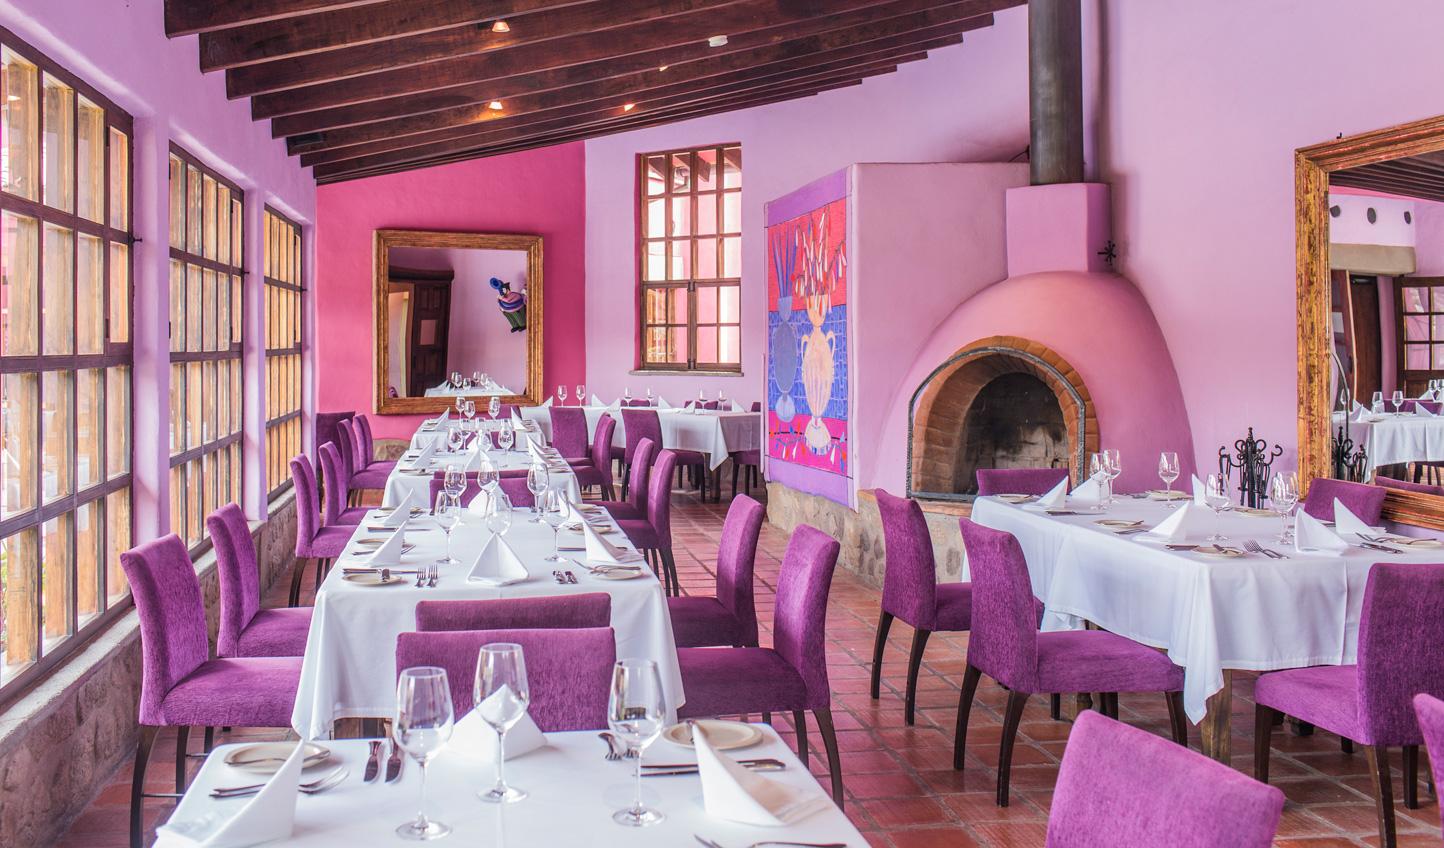 Sample Peruvian cuisine at Killa Wasi Restaurant